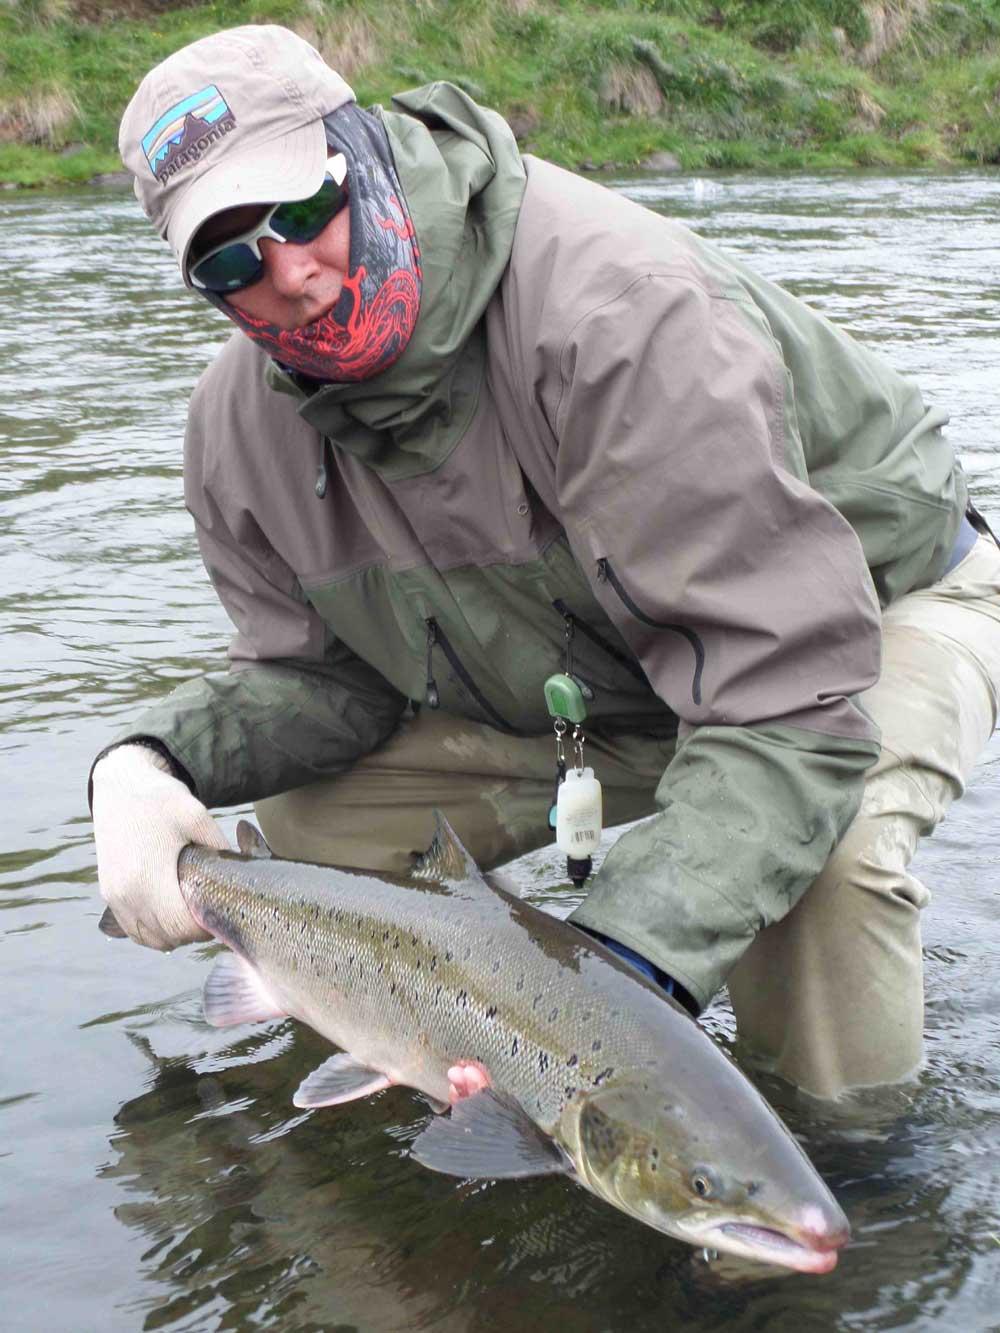 River Sog - Fly Fishing Iceland - Salmon - gofishing.is